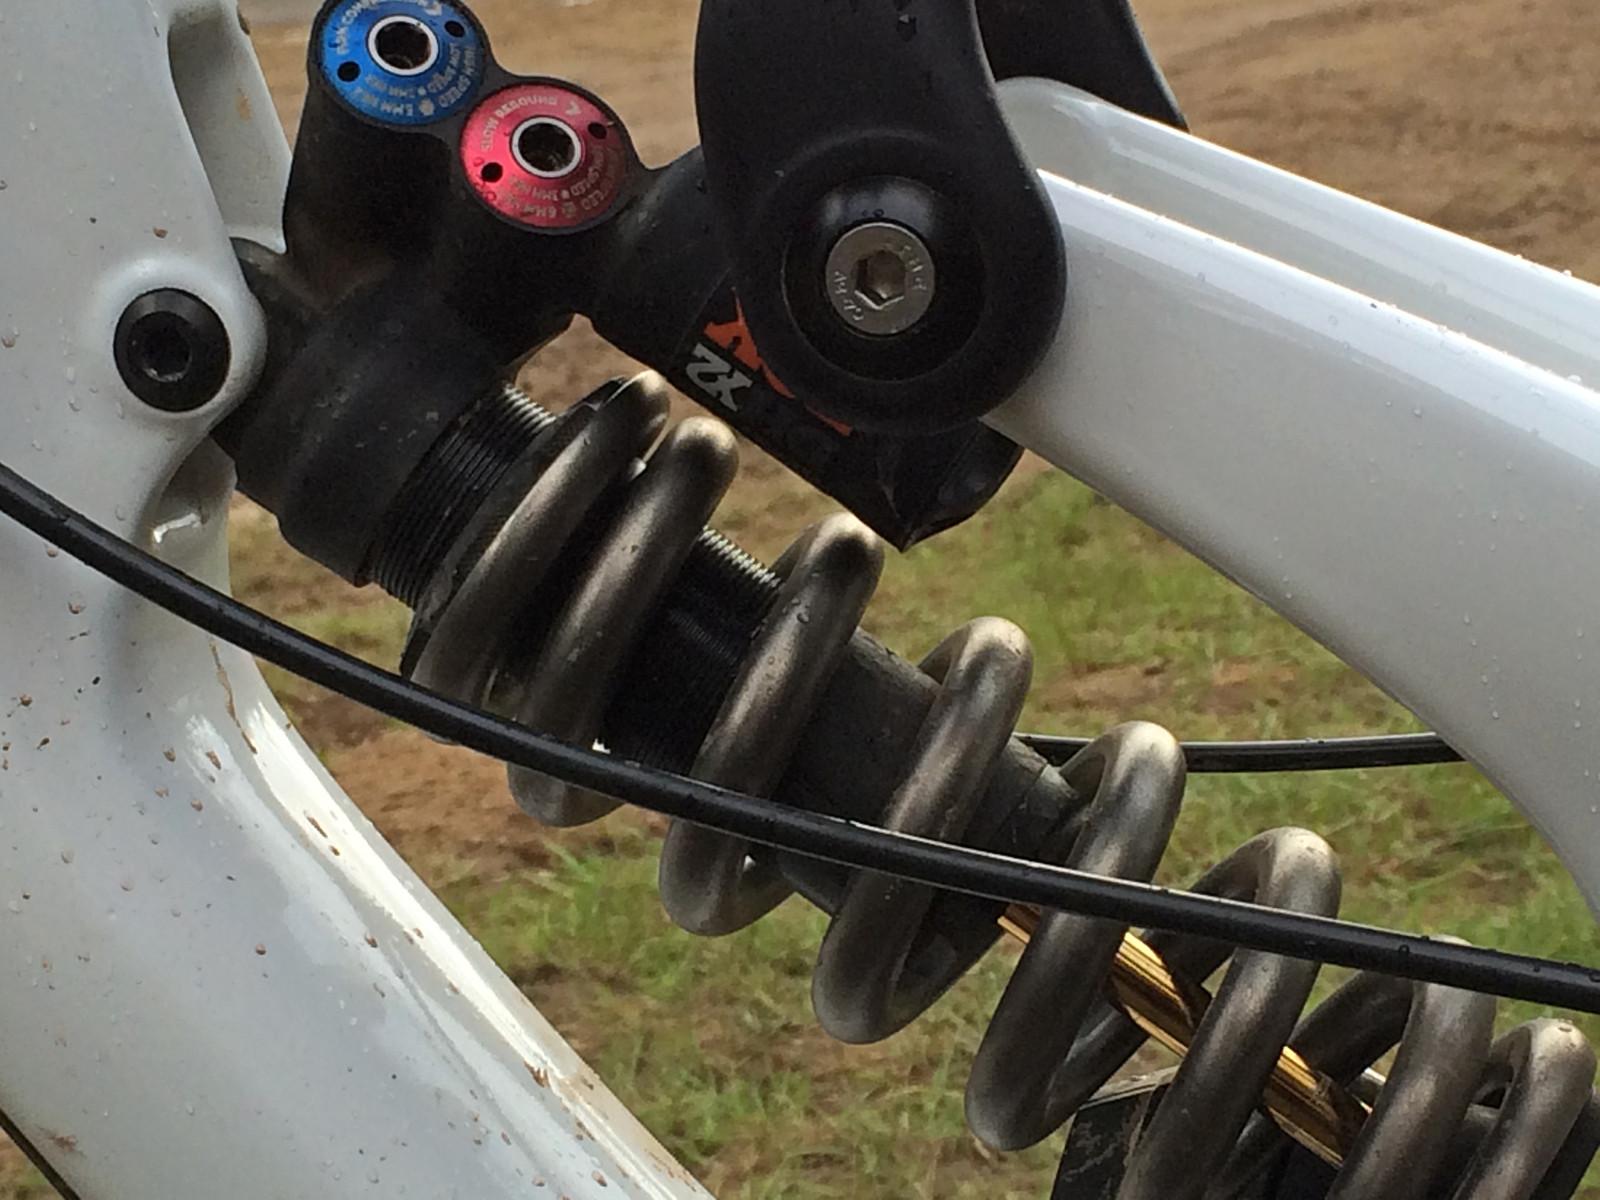 FOX DHX2 on Kiran MacKinon's V10cc - PIT BITS - Port Angeles ProGRT - Mountain Biking Pictures - Vital MTB